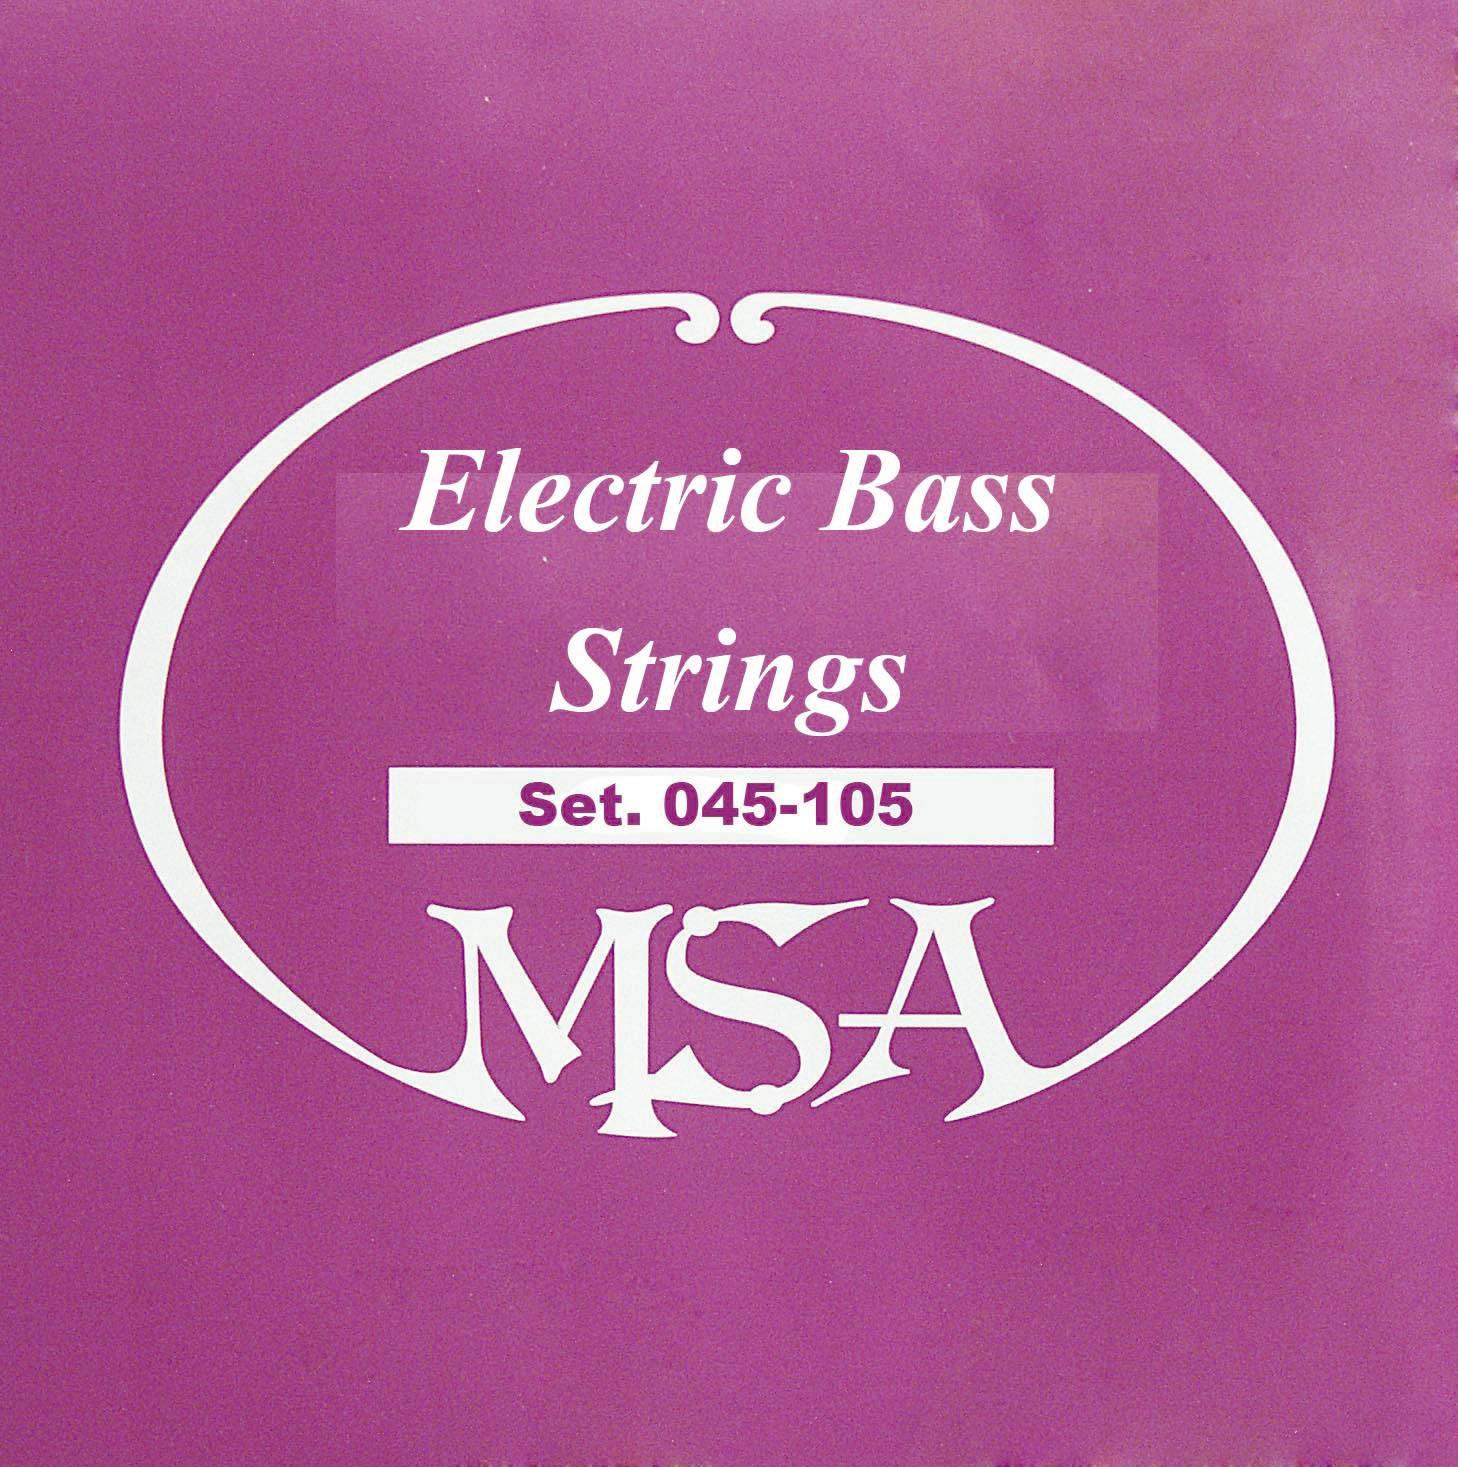 Struny na baskytaru MSA, 045-105